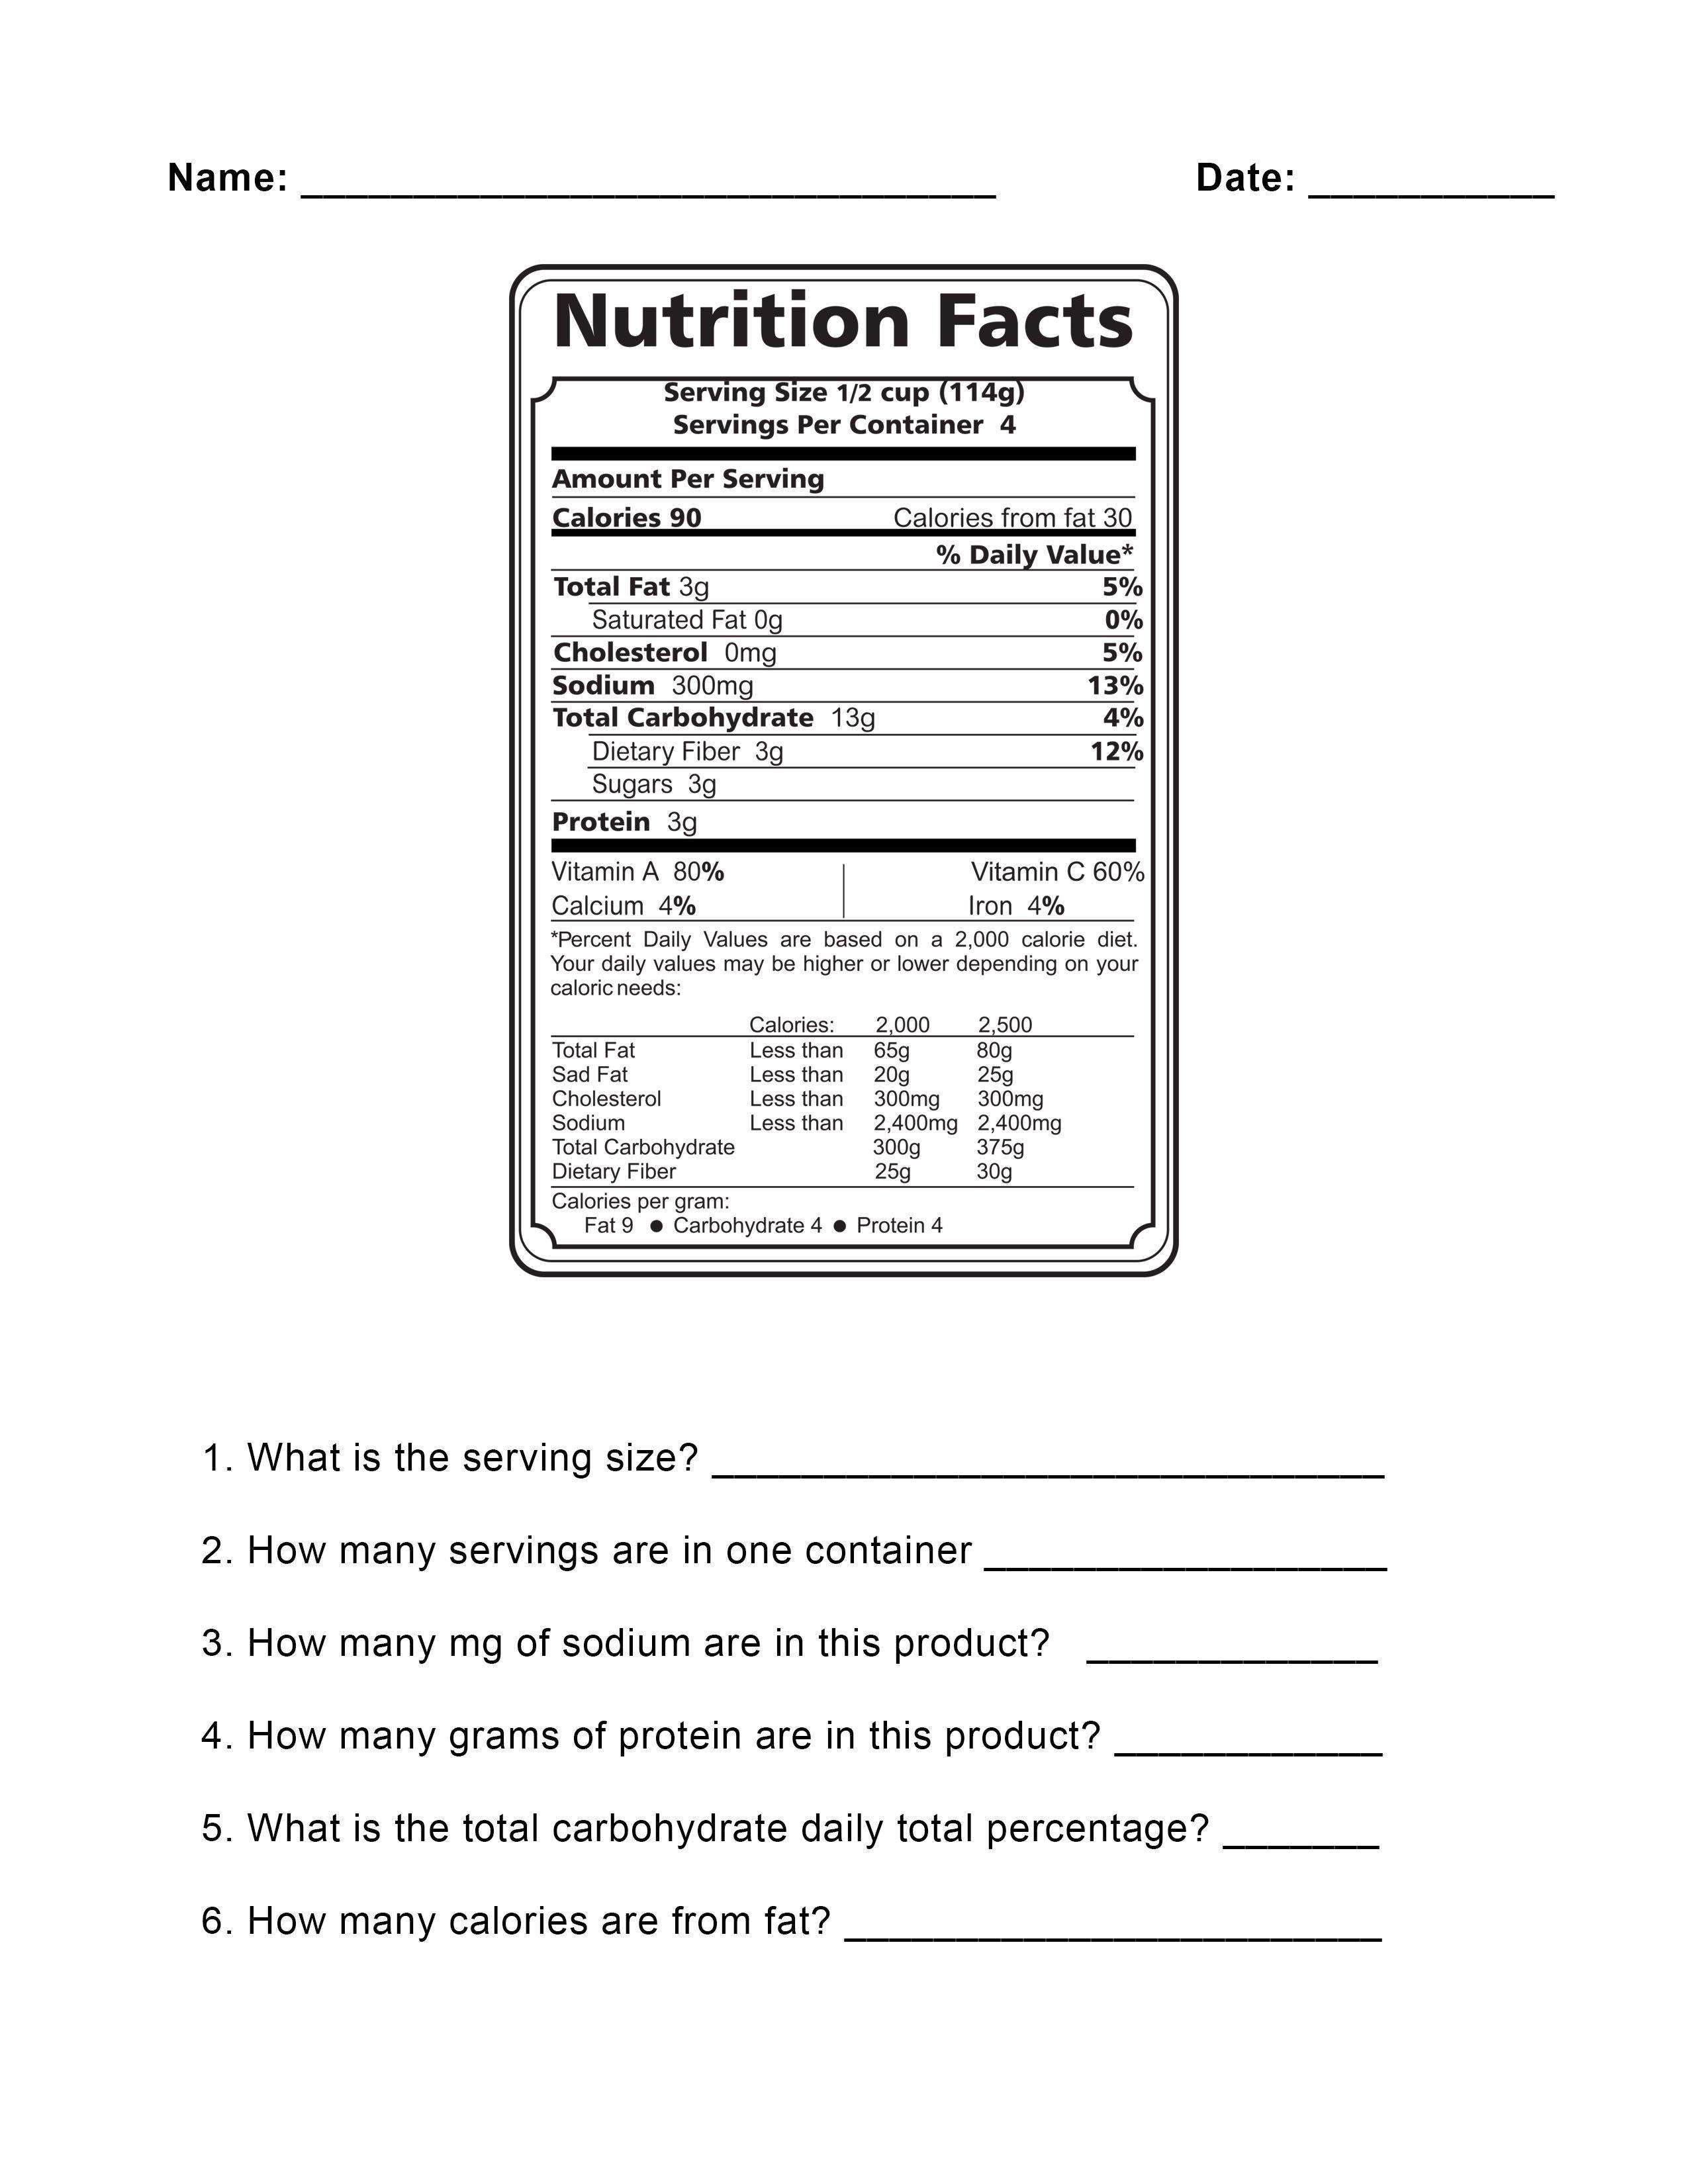 Food Label Worksheet Demire Agdiffusion Pertaining To Blank Nutrition Label Worksheet20635 Nutrition Facts Label Reading Food Labels Nutrition Labels [ 3300 x 2550 Pixel ]